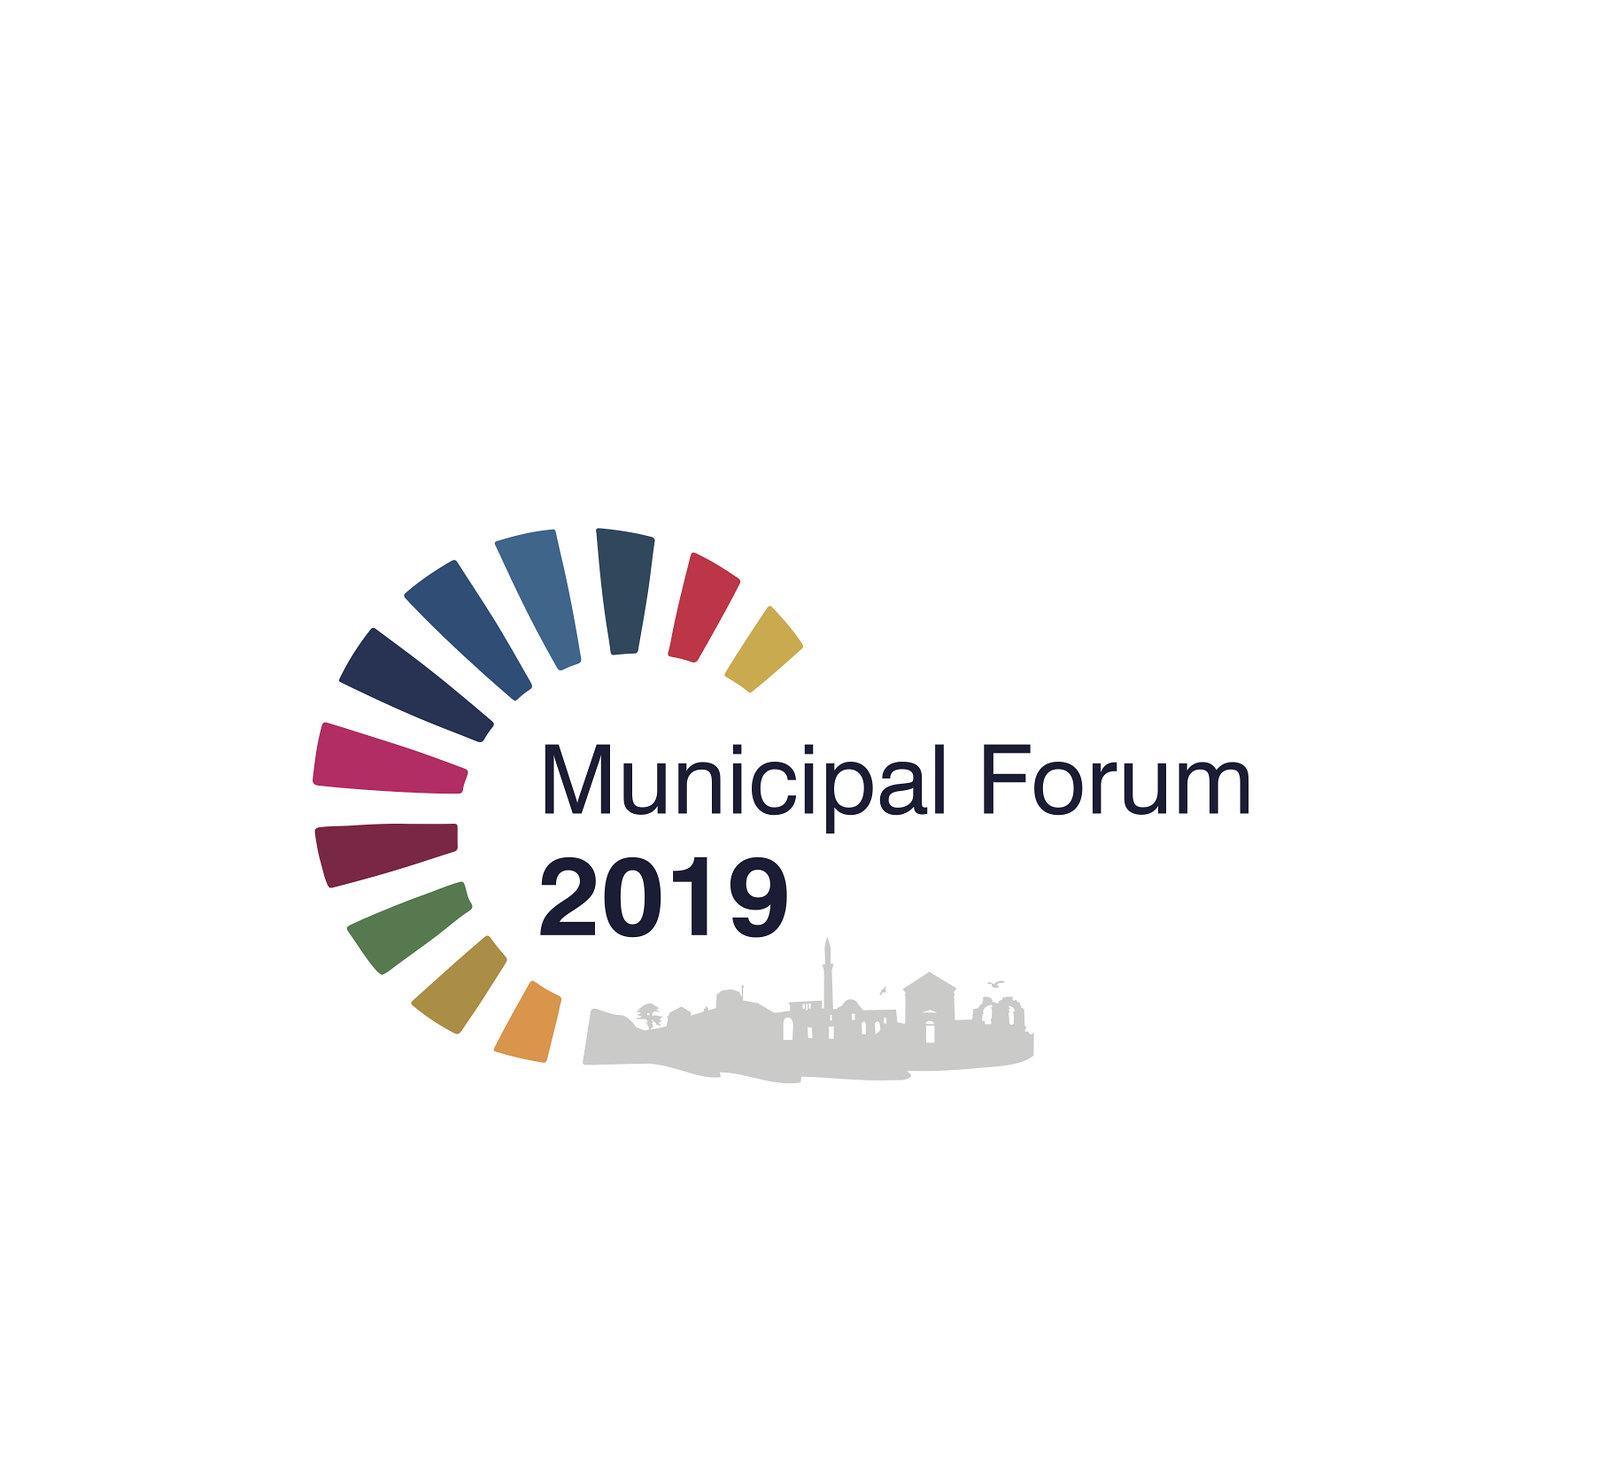 municipal forum logos